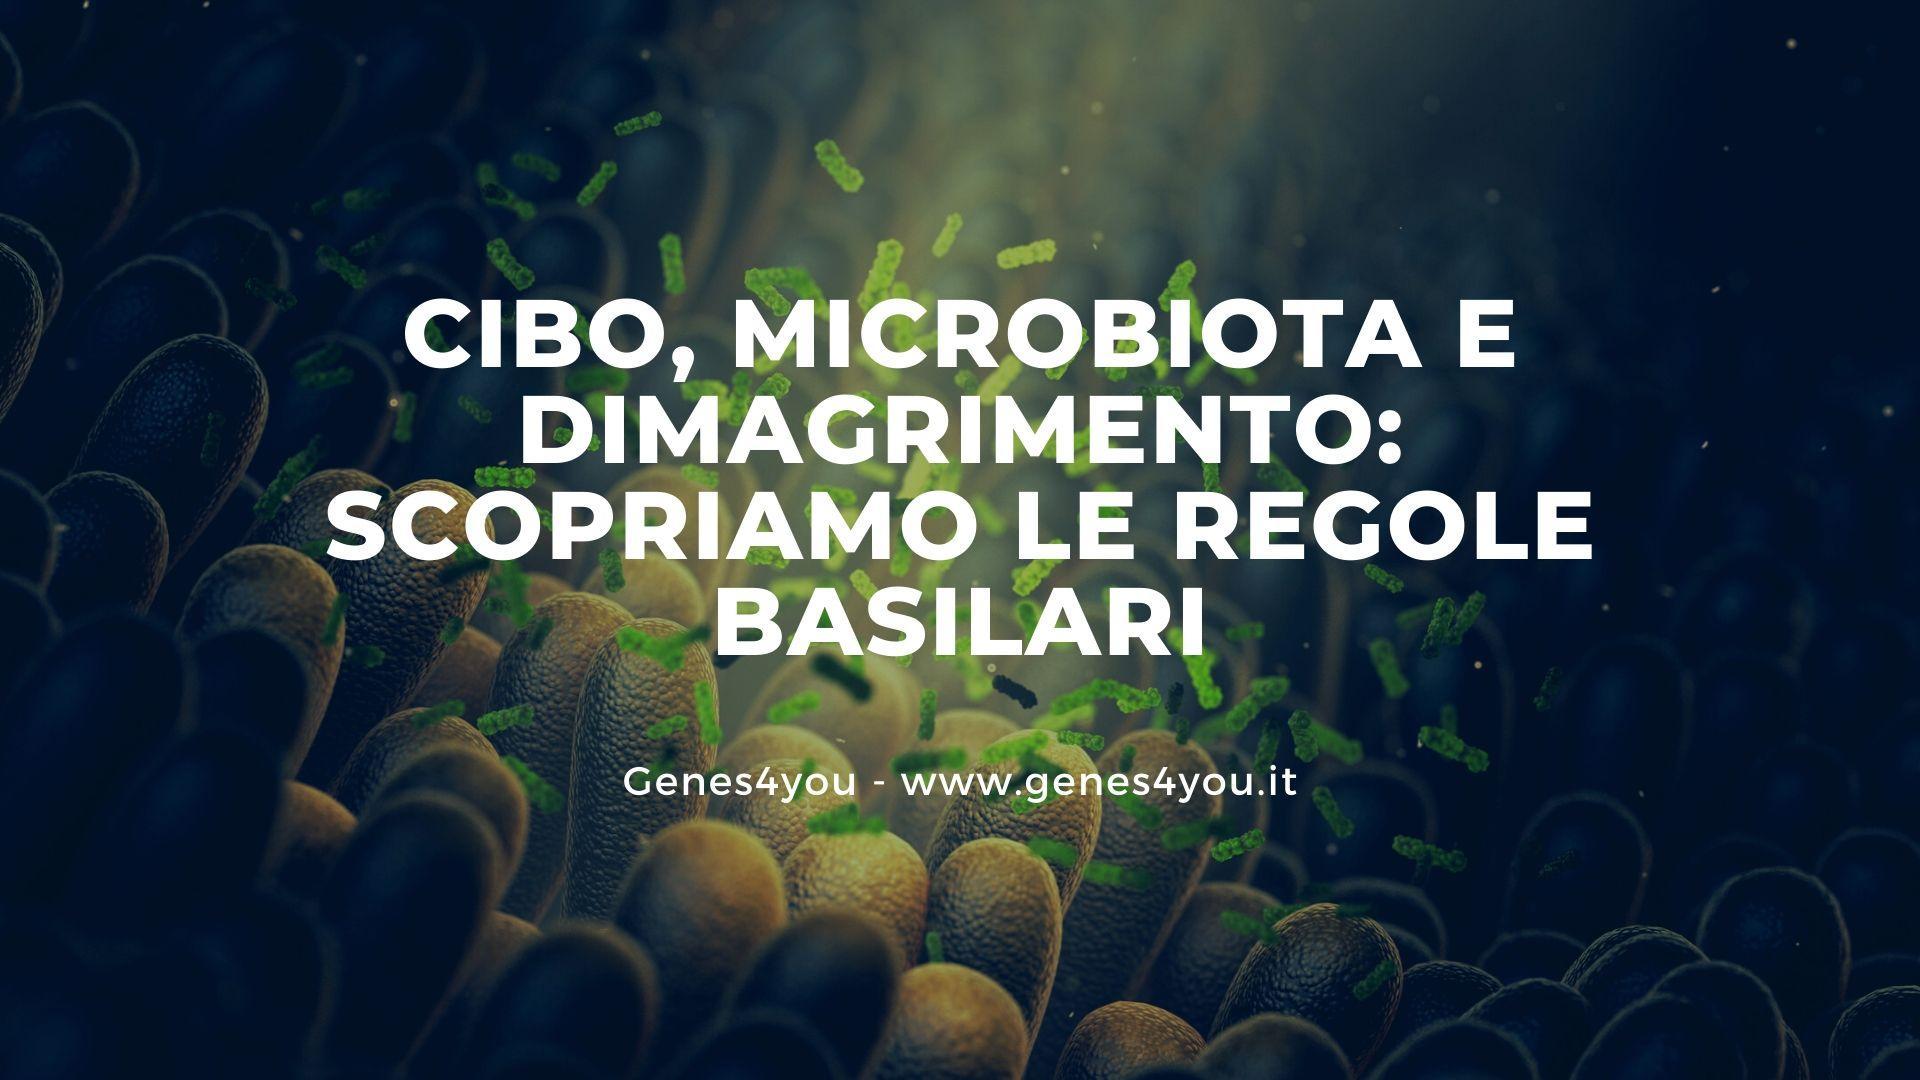 Cibo, microbiota e dimagrimento_ scopriamo le regole basilari - Genes4you(1)